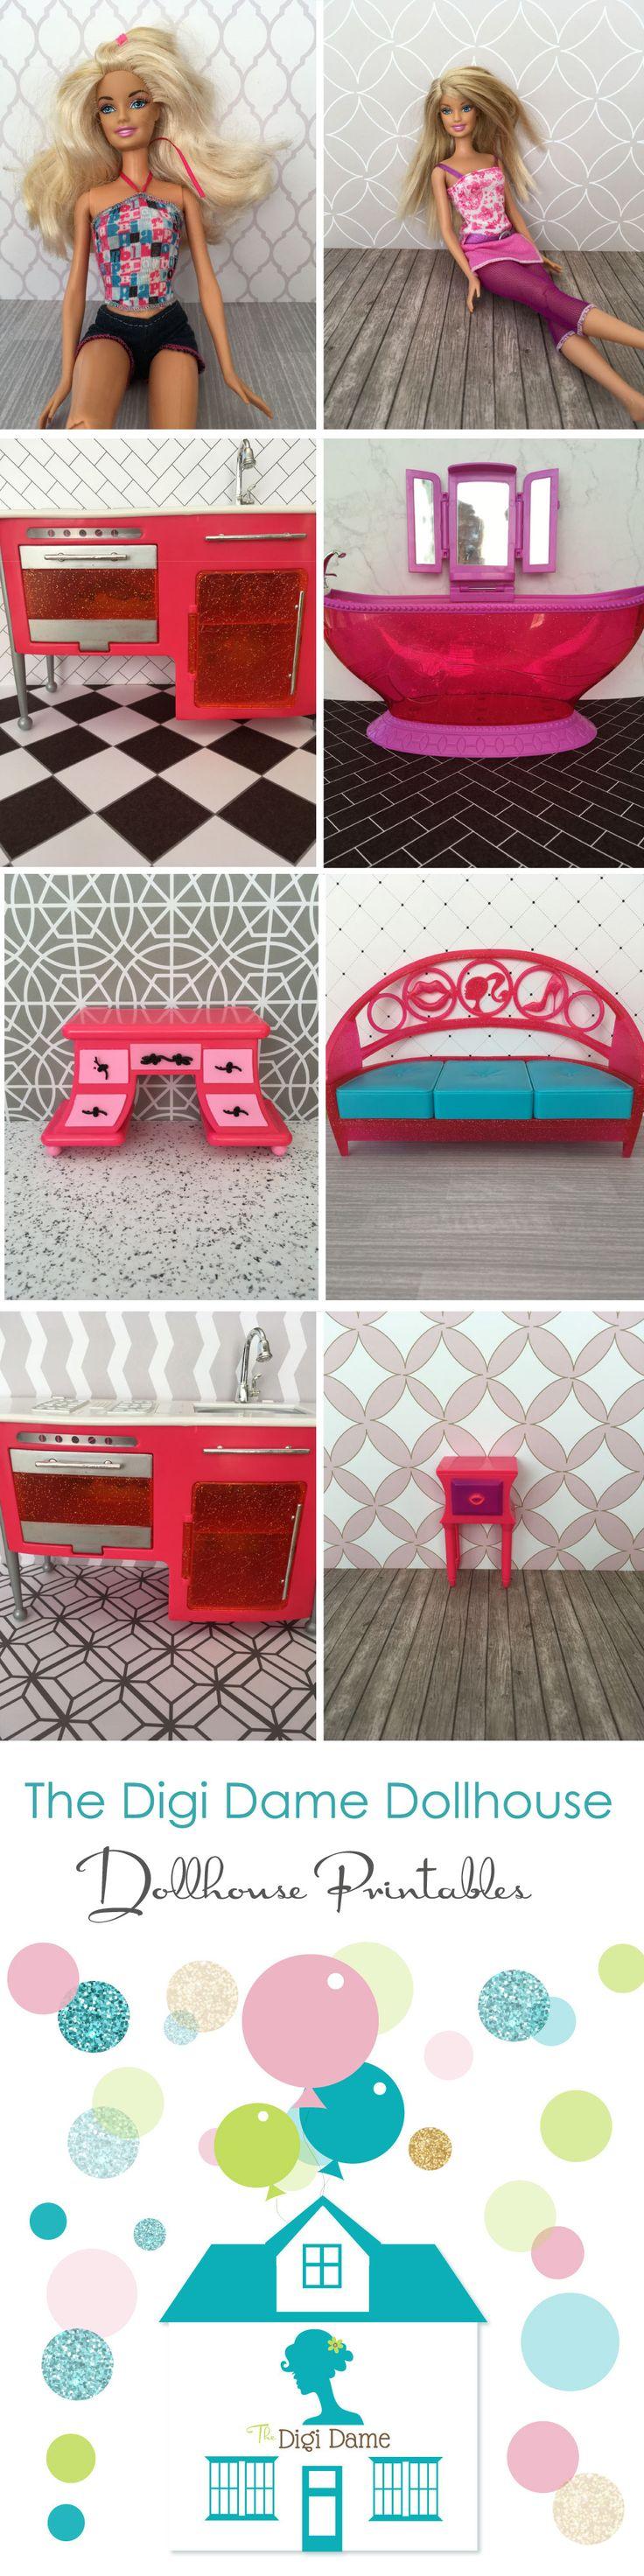 Dollhouse Printables by The Digi Dame Dollhouse on Etsy digidamedolls.etsy.com Buy 2 Get 1 FREE